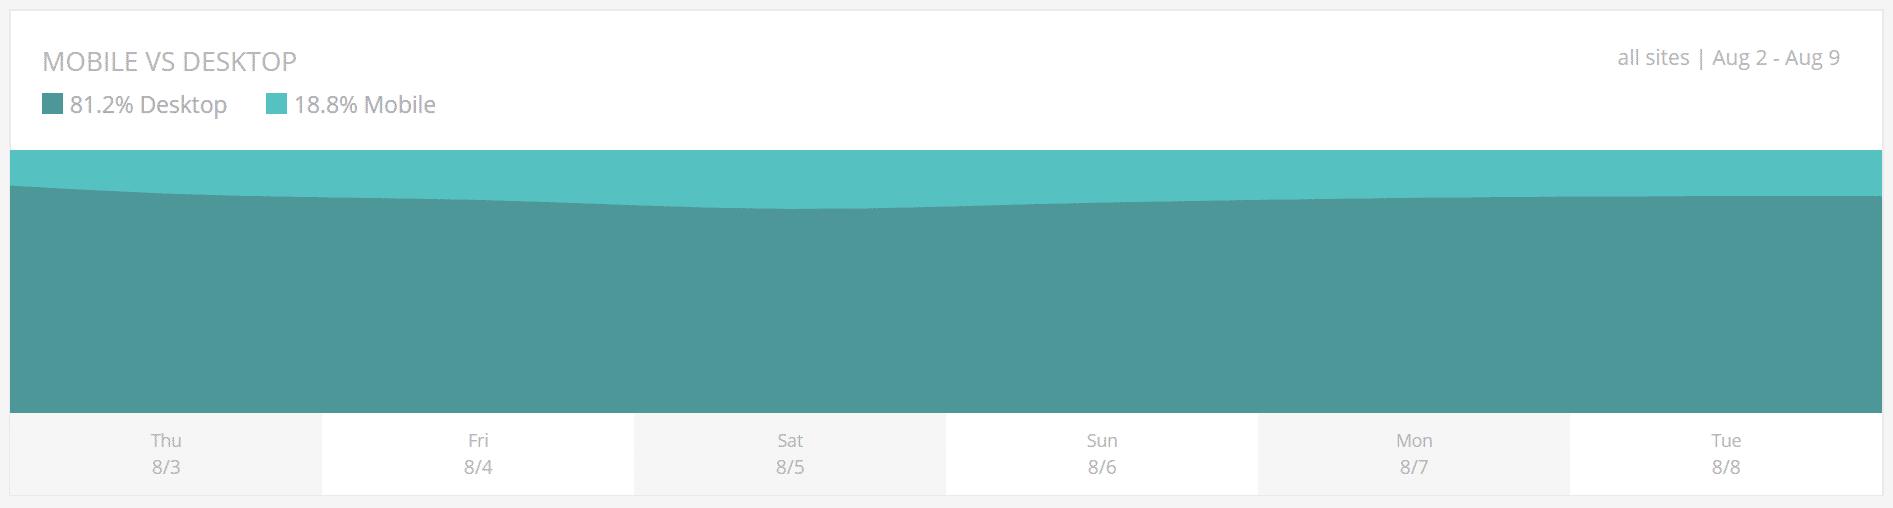 Visitor Analysis - Mobile vs desktop